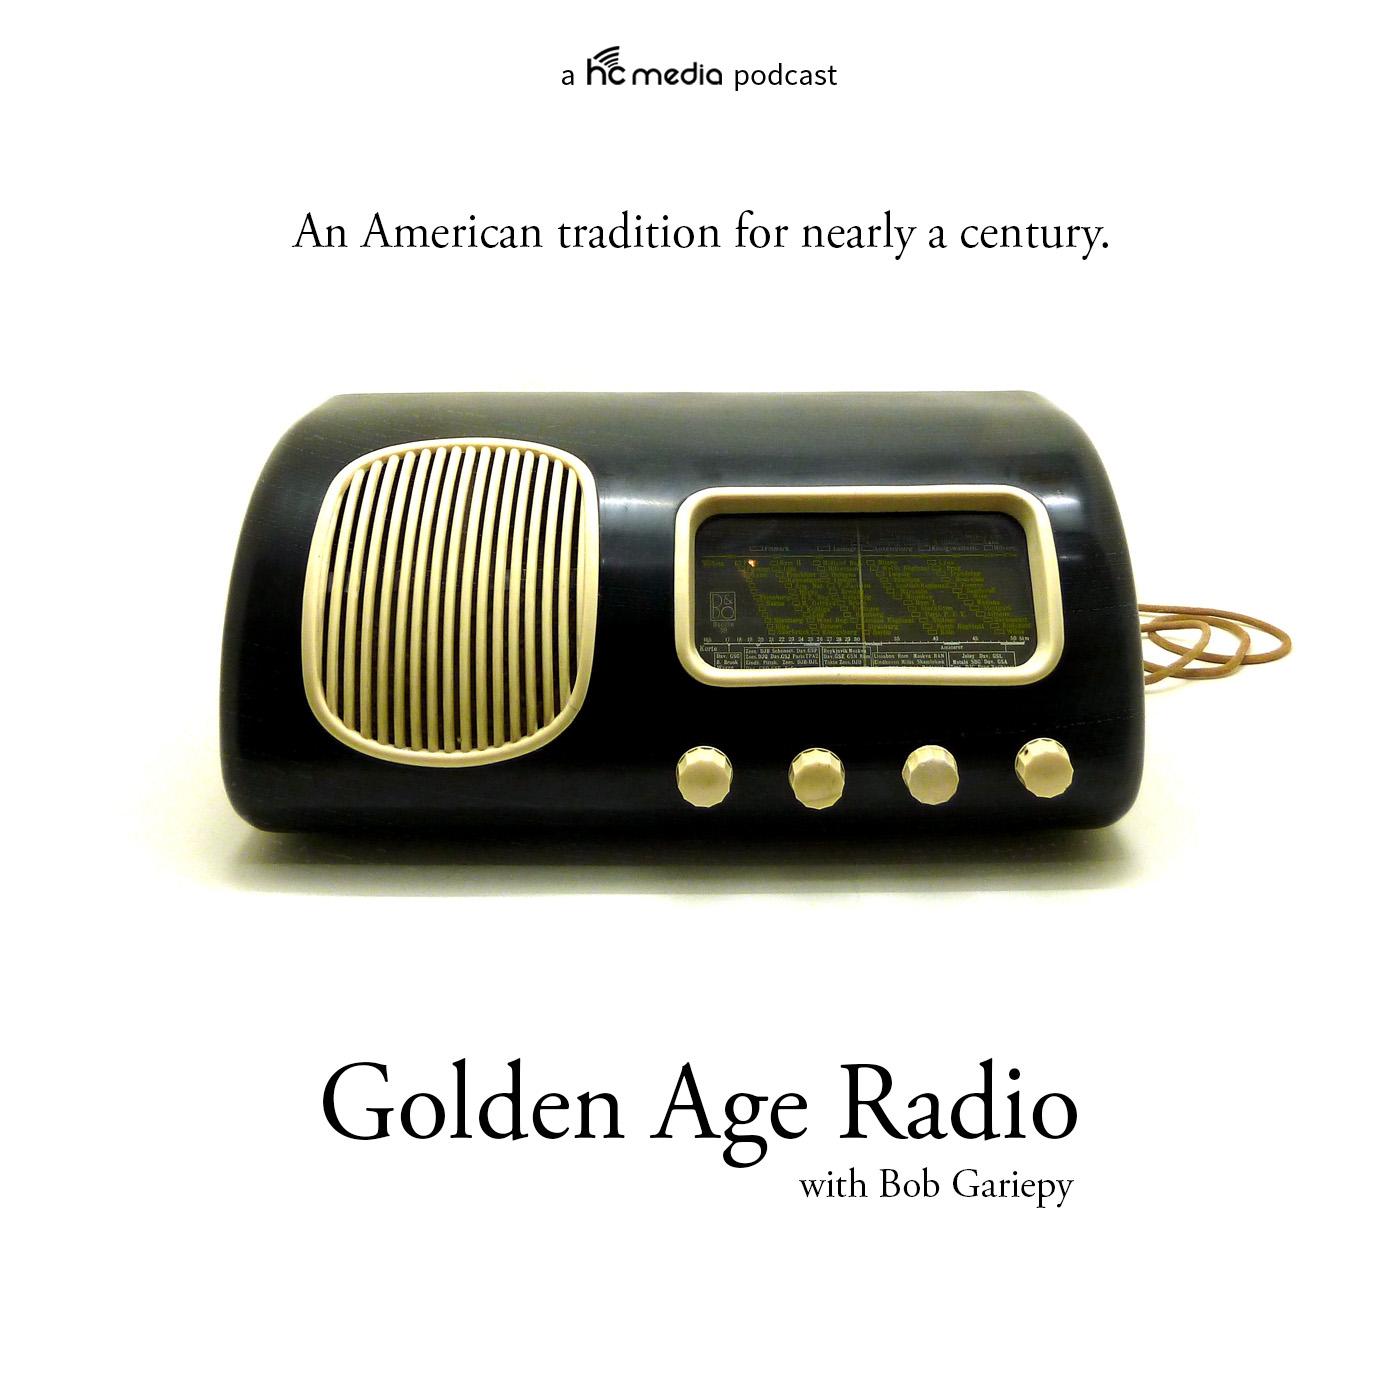 Golden Age Radio